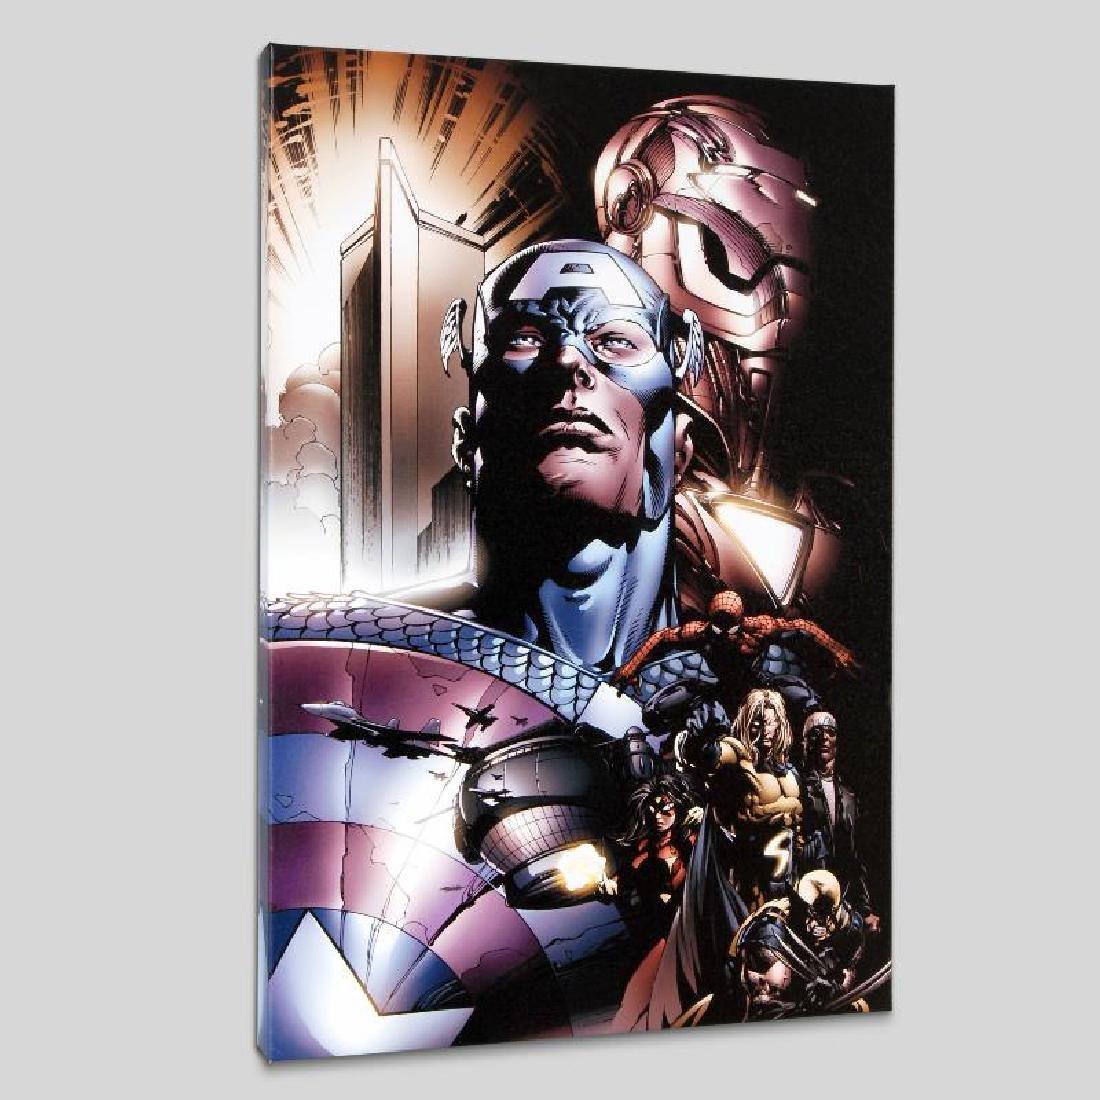 New Avengers #6 by Marvel Comics